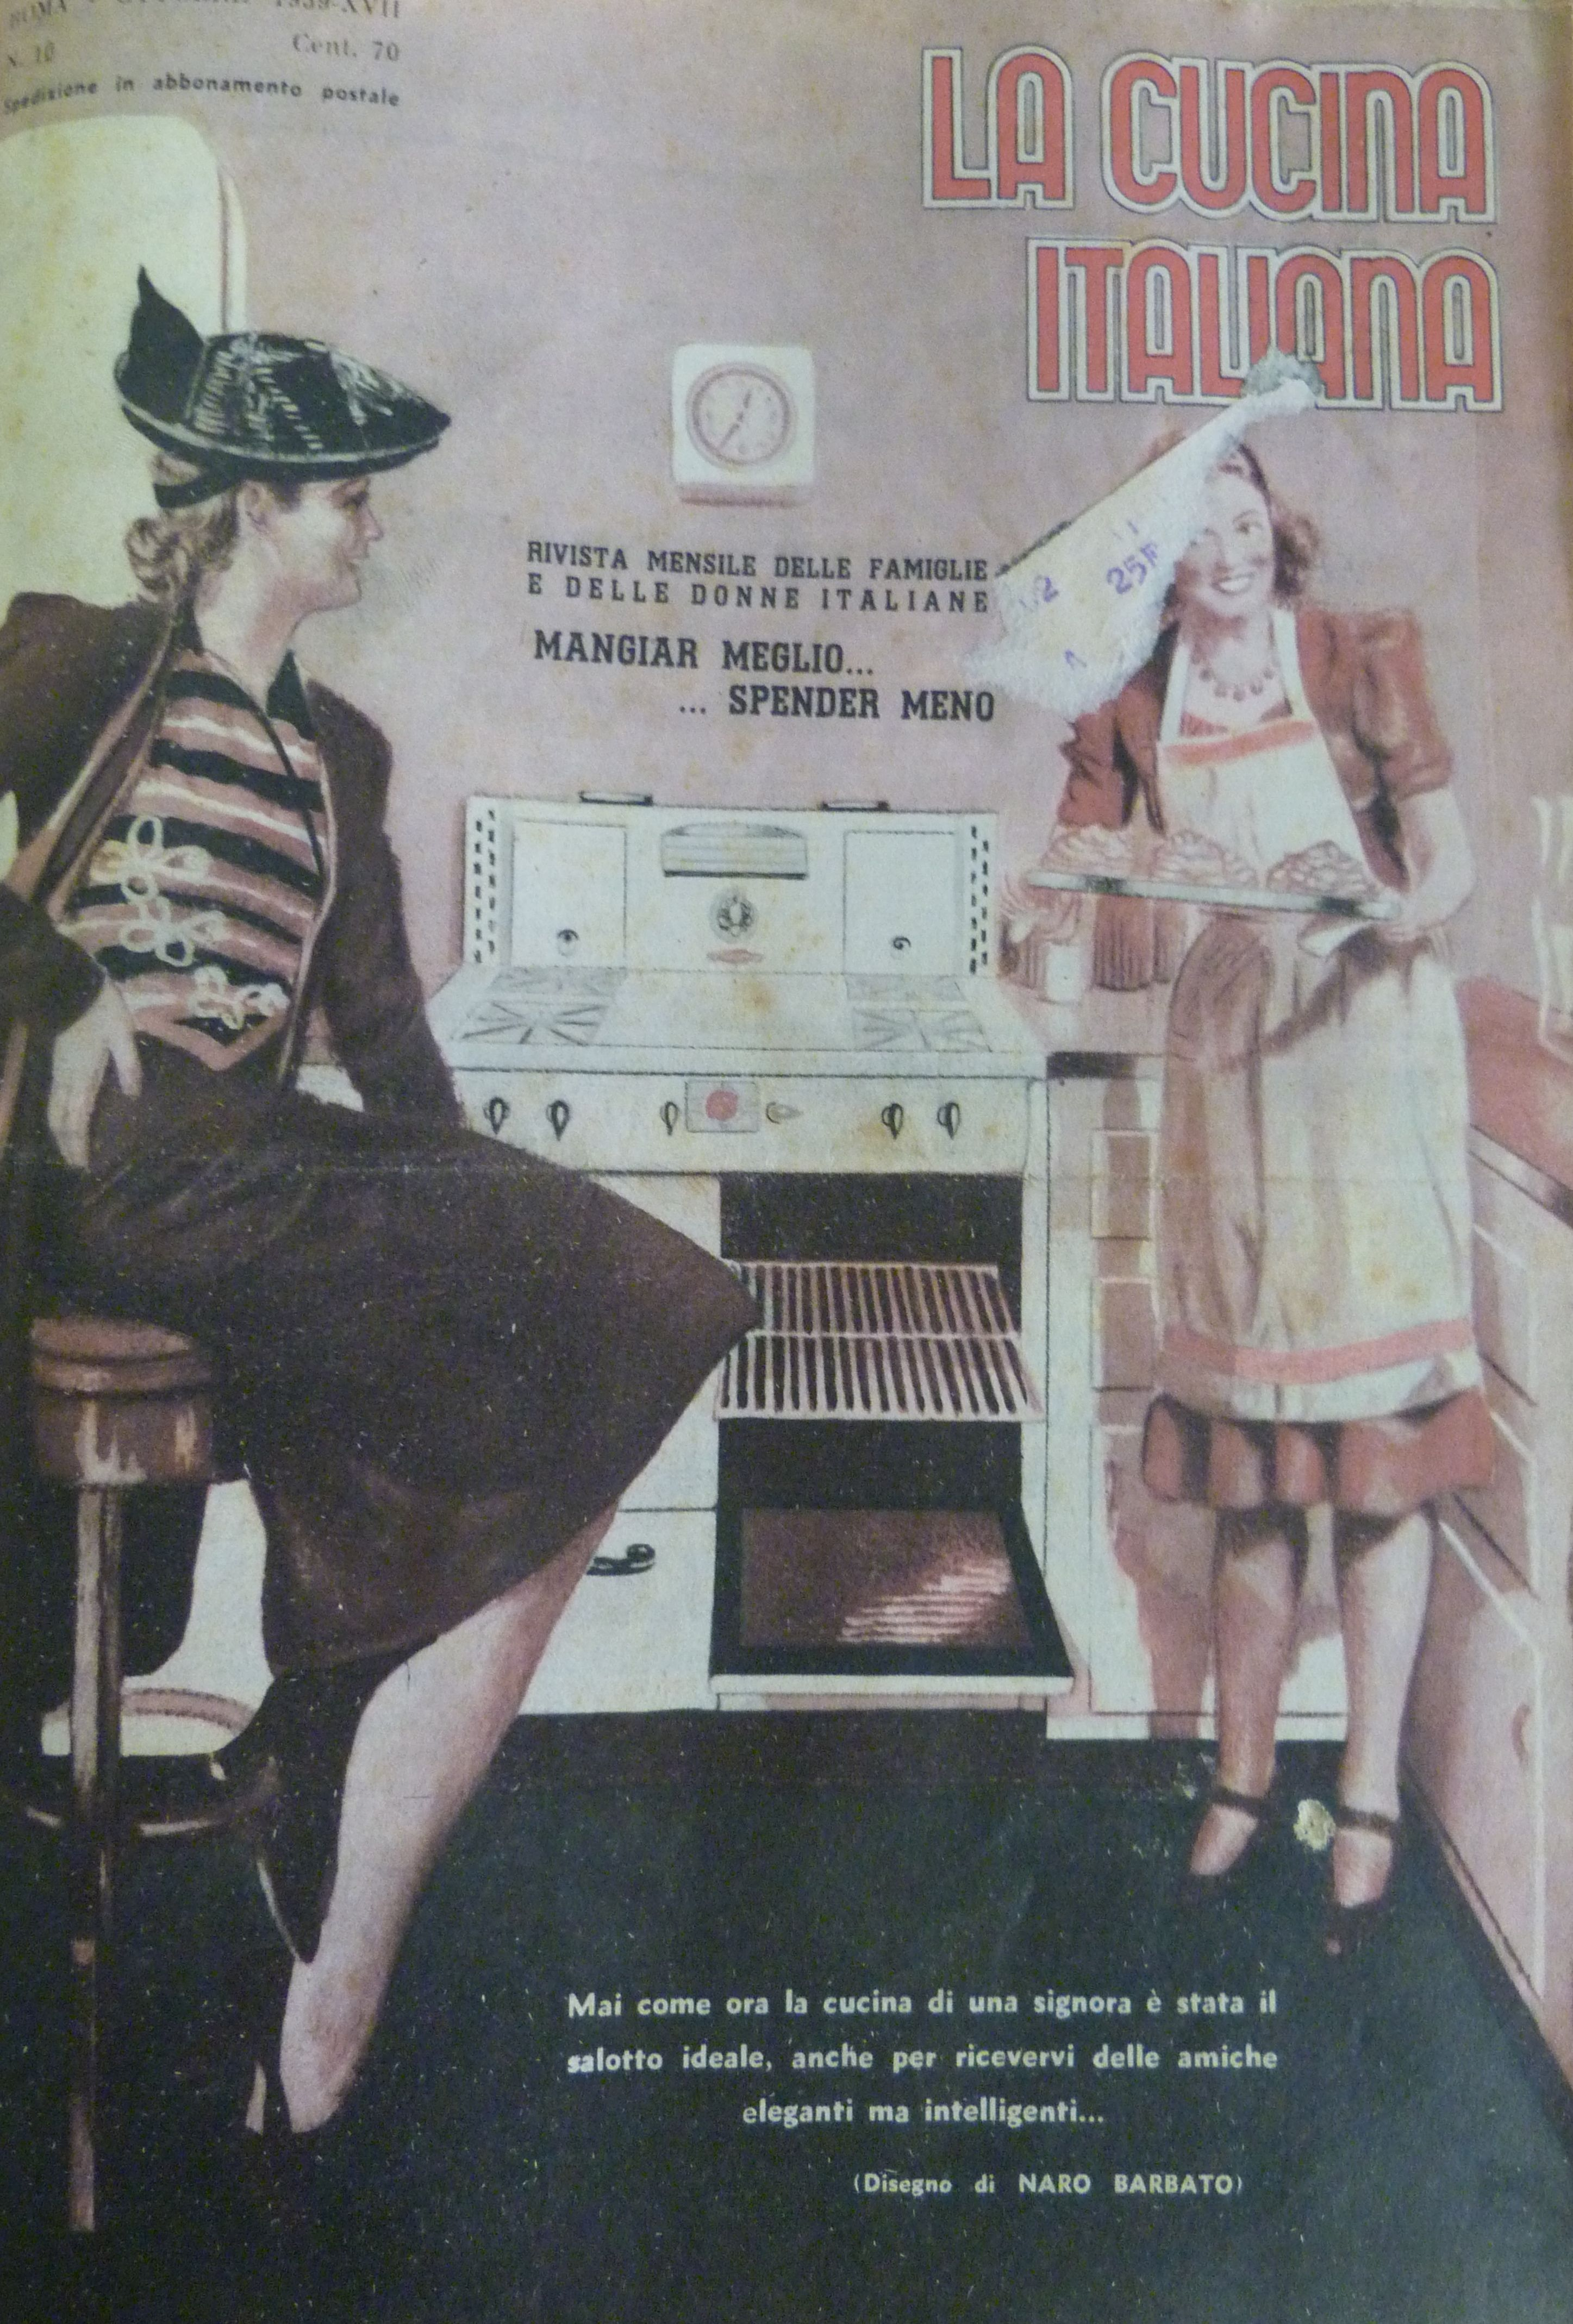 1939 cooking entertainment recipe cucina cucina for La cucina italiana